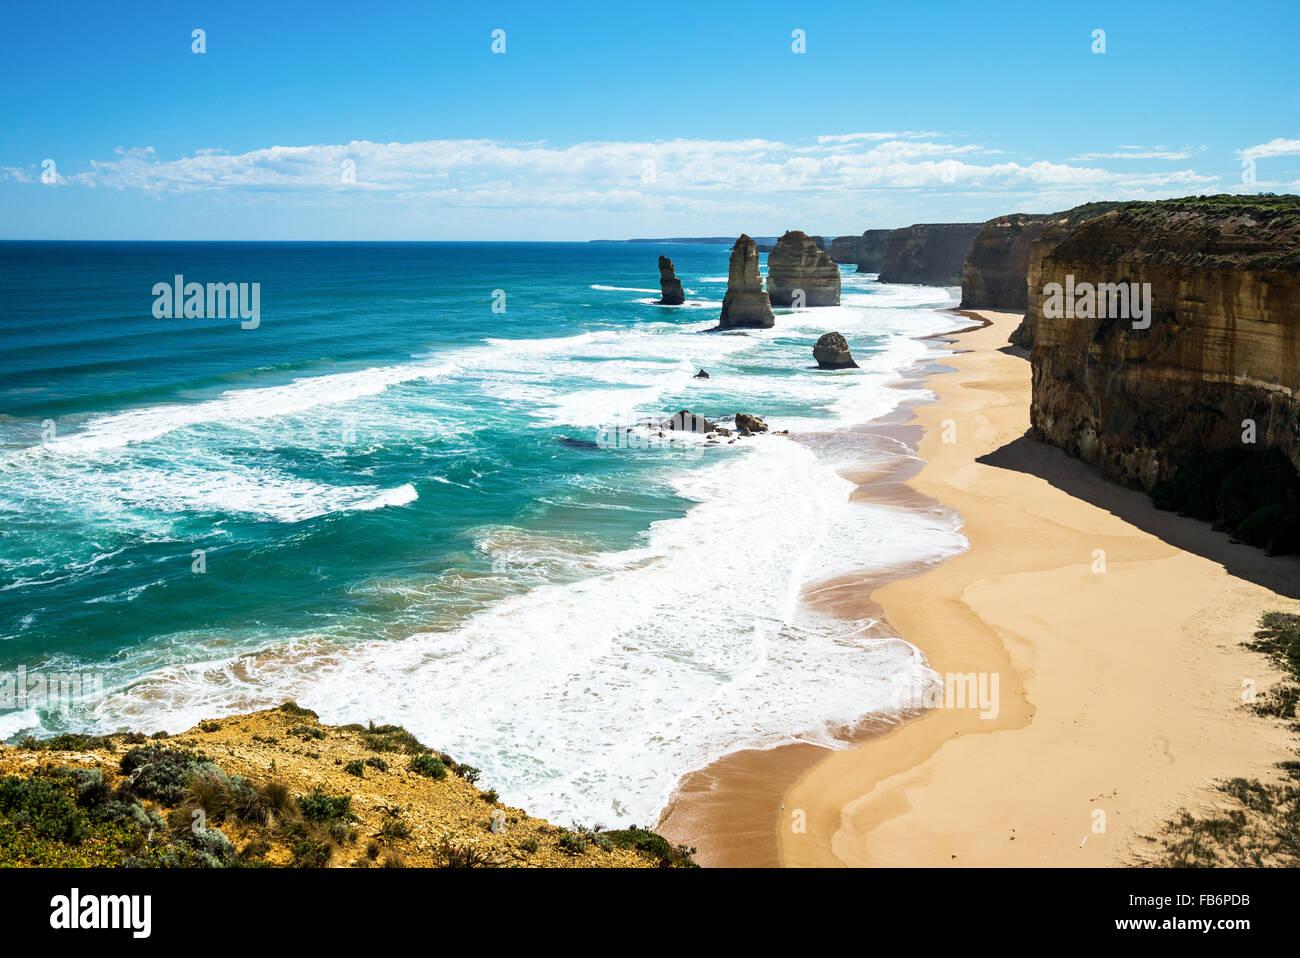 Australien, Port Campbell, die zwölf Apostel Meerespark Stockfoto